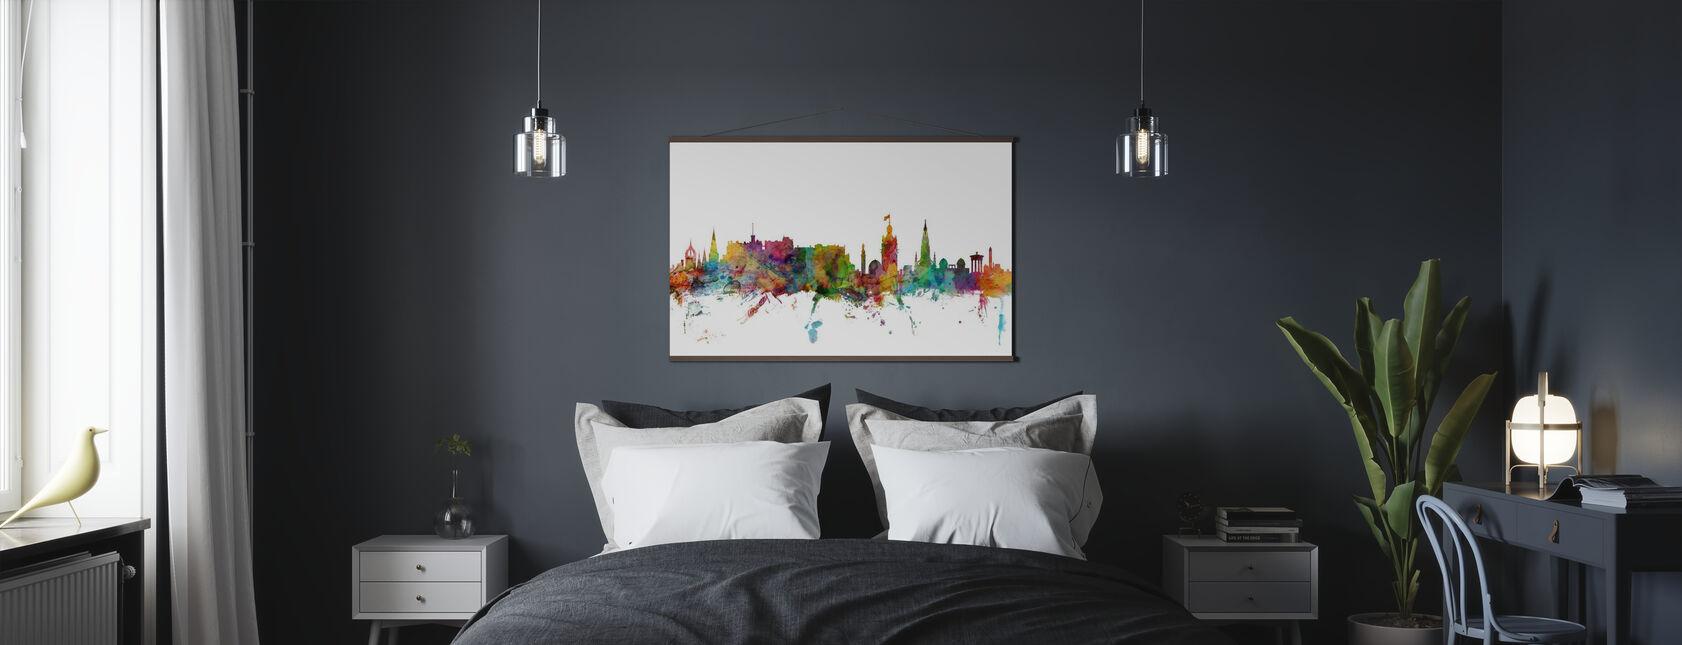 Edinburgh Skyline - Poster - Bedroom